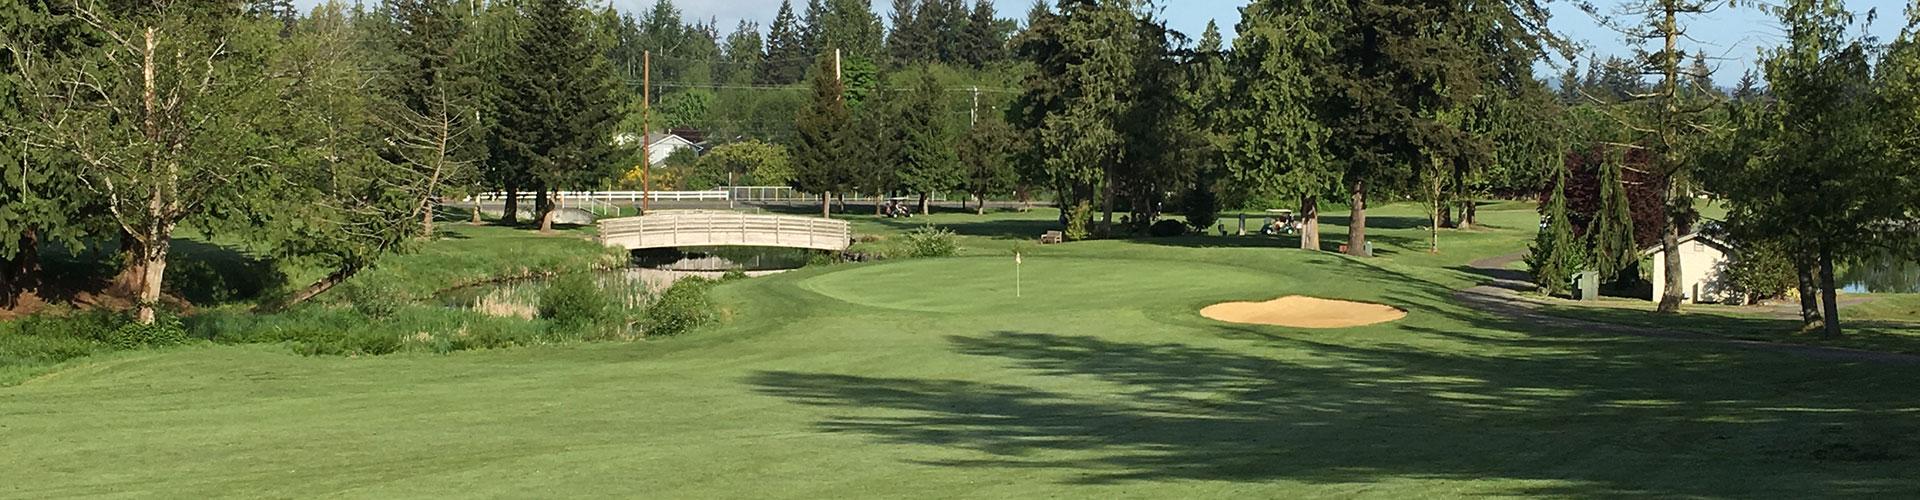 Premier Golf Centers - Cedarcrest